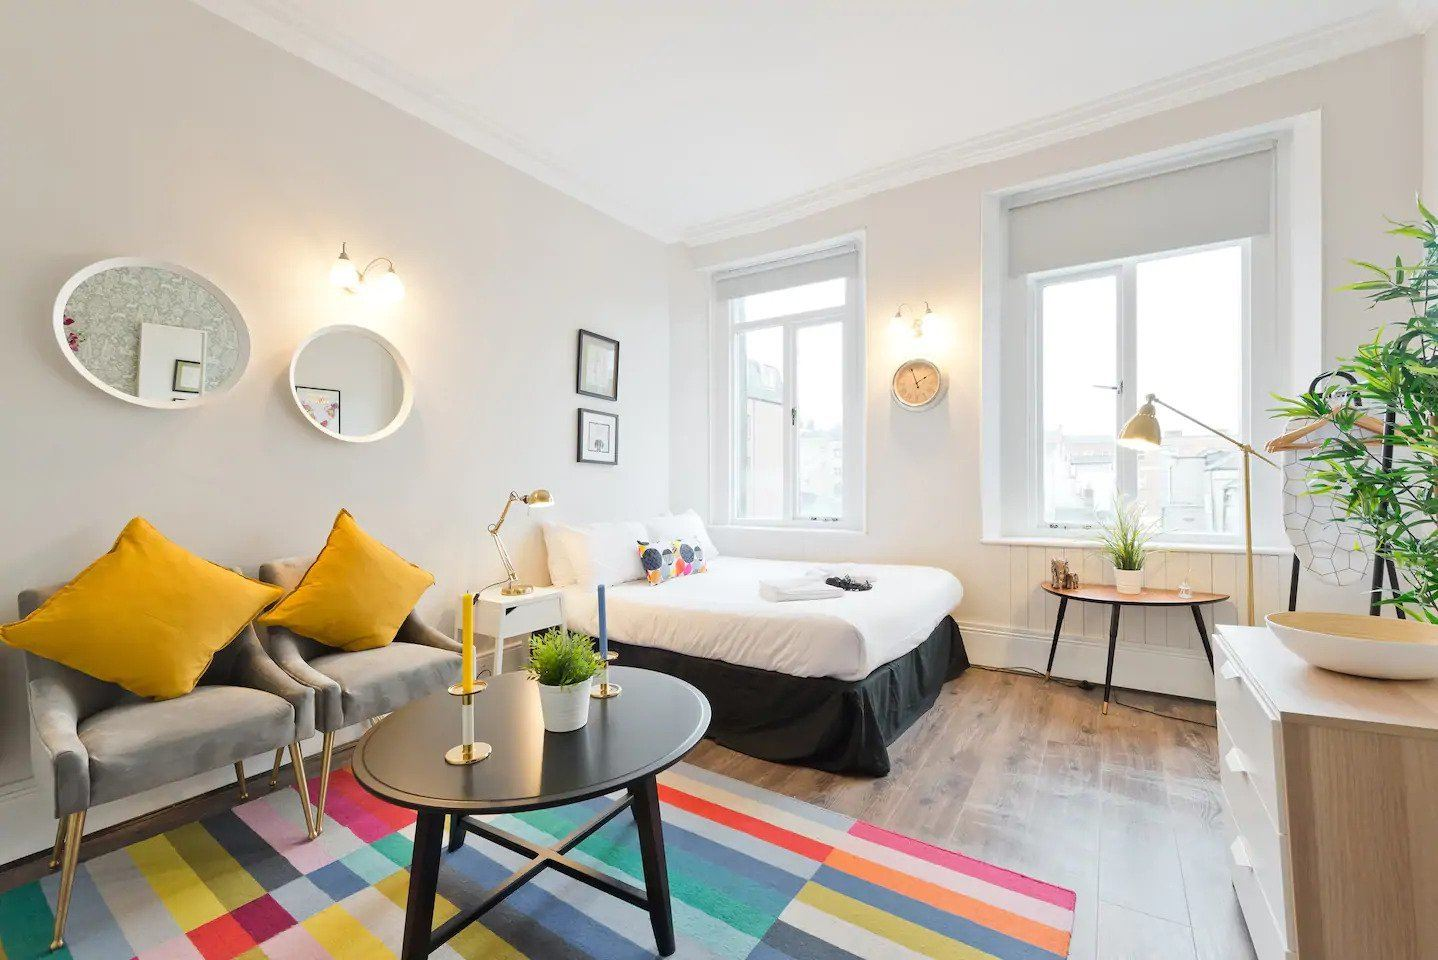 Ireland accommodation prices